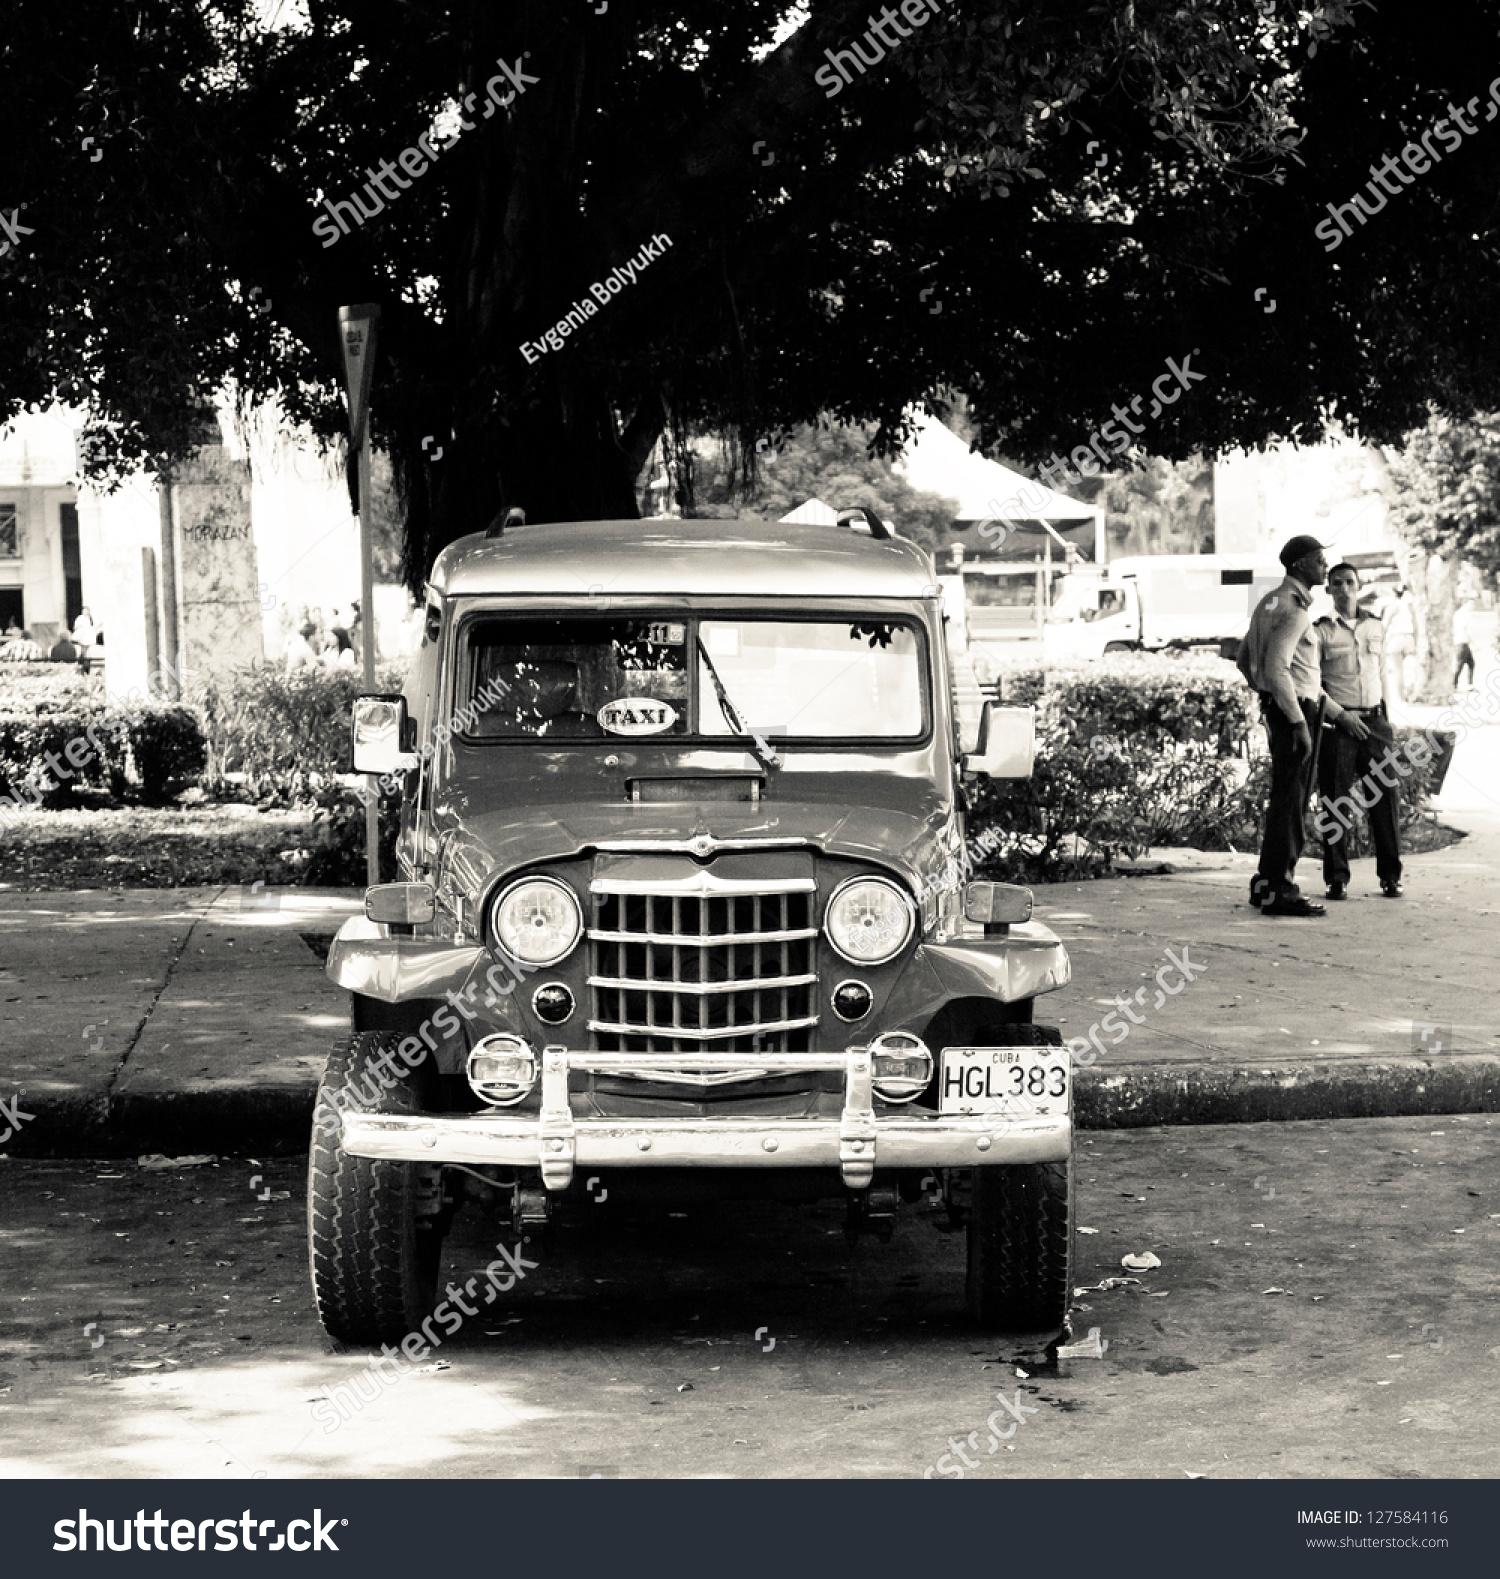 Havana Cuba Dec 30 Old Classic Stock Photo 127584116 - Shutterstock